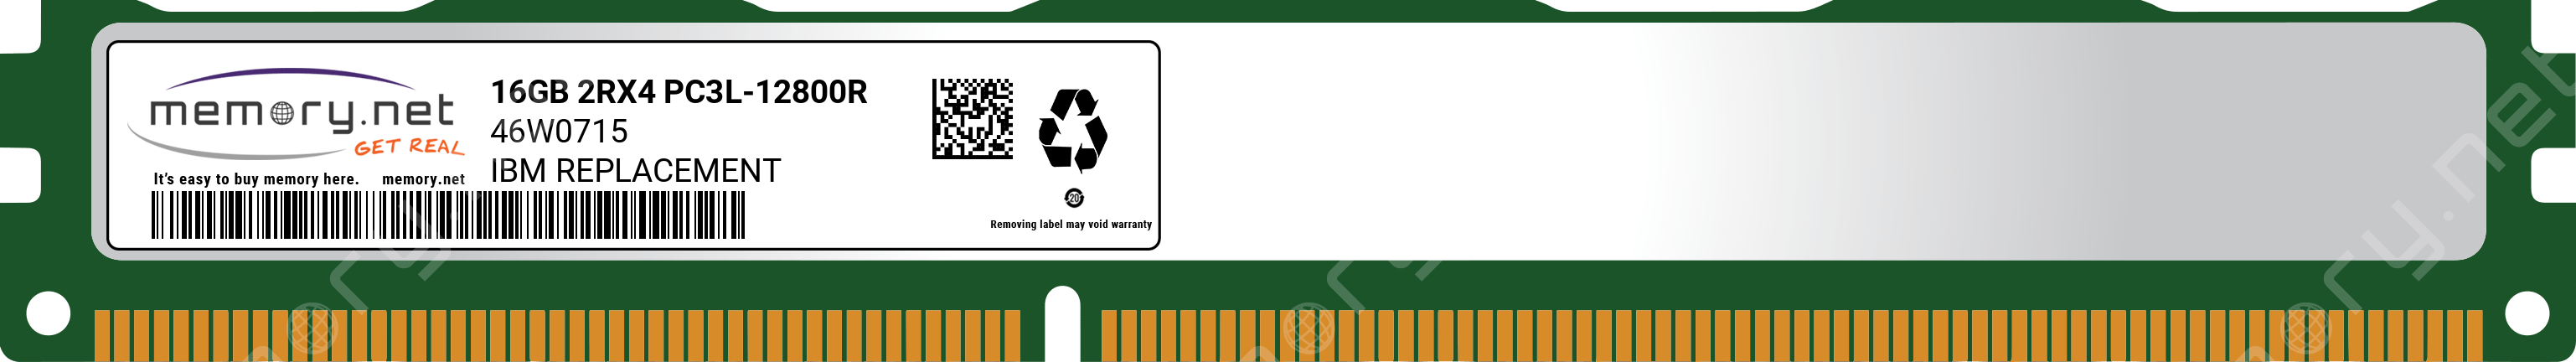 46W0715